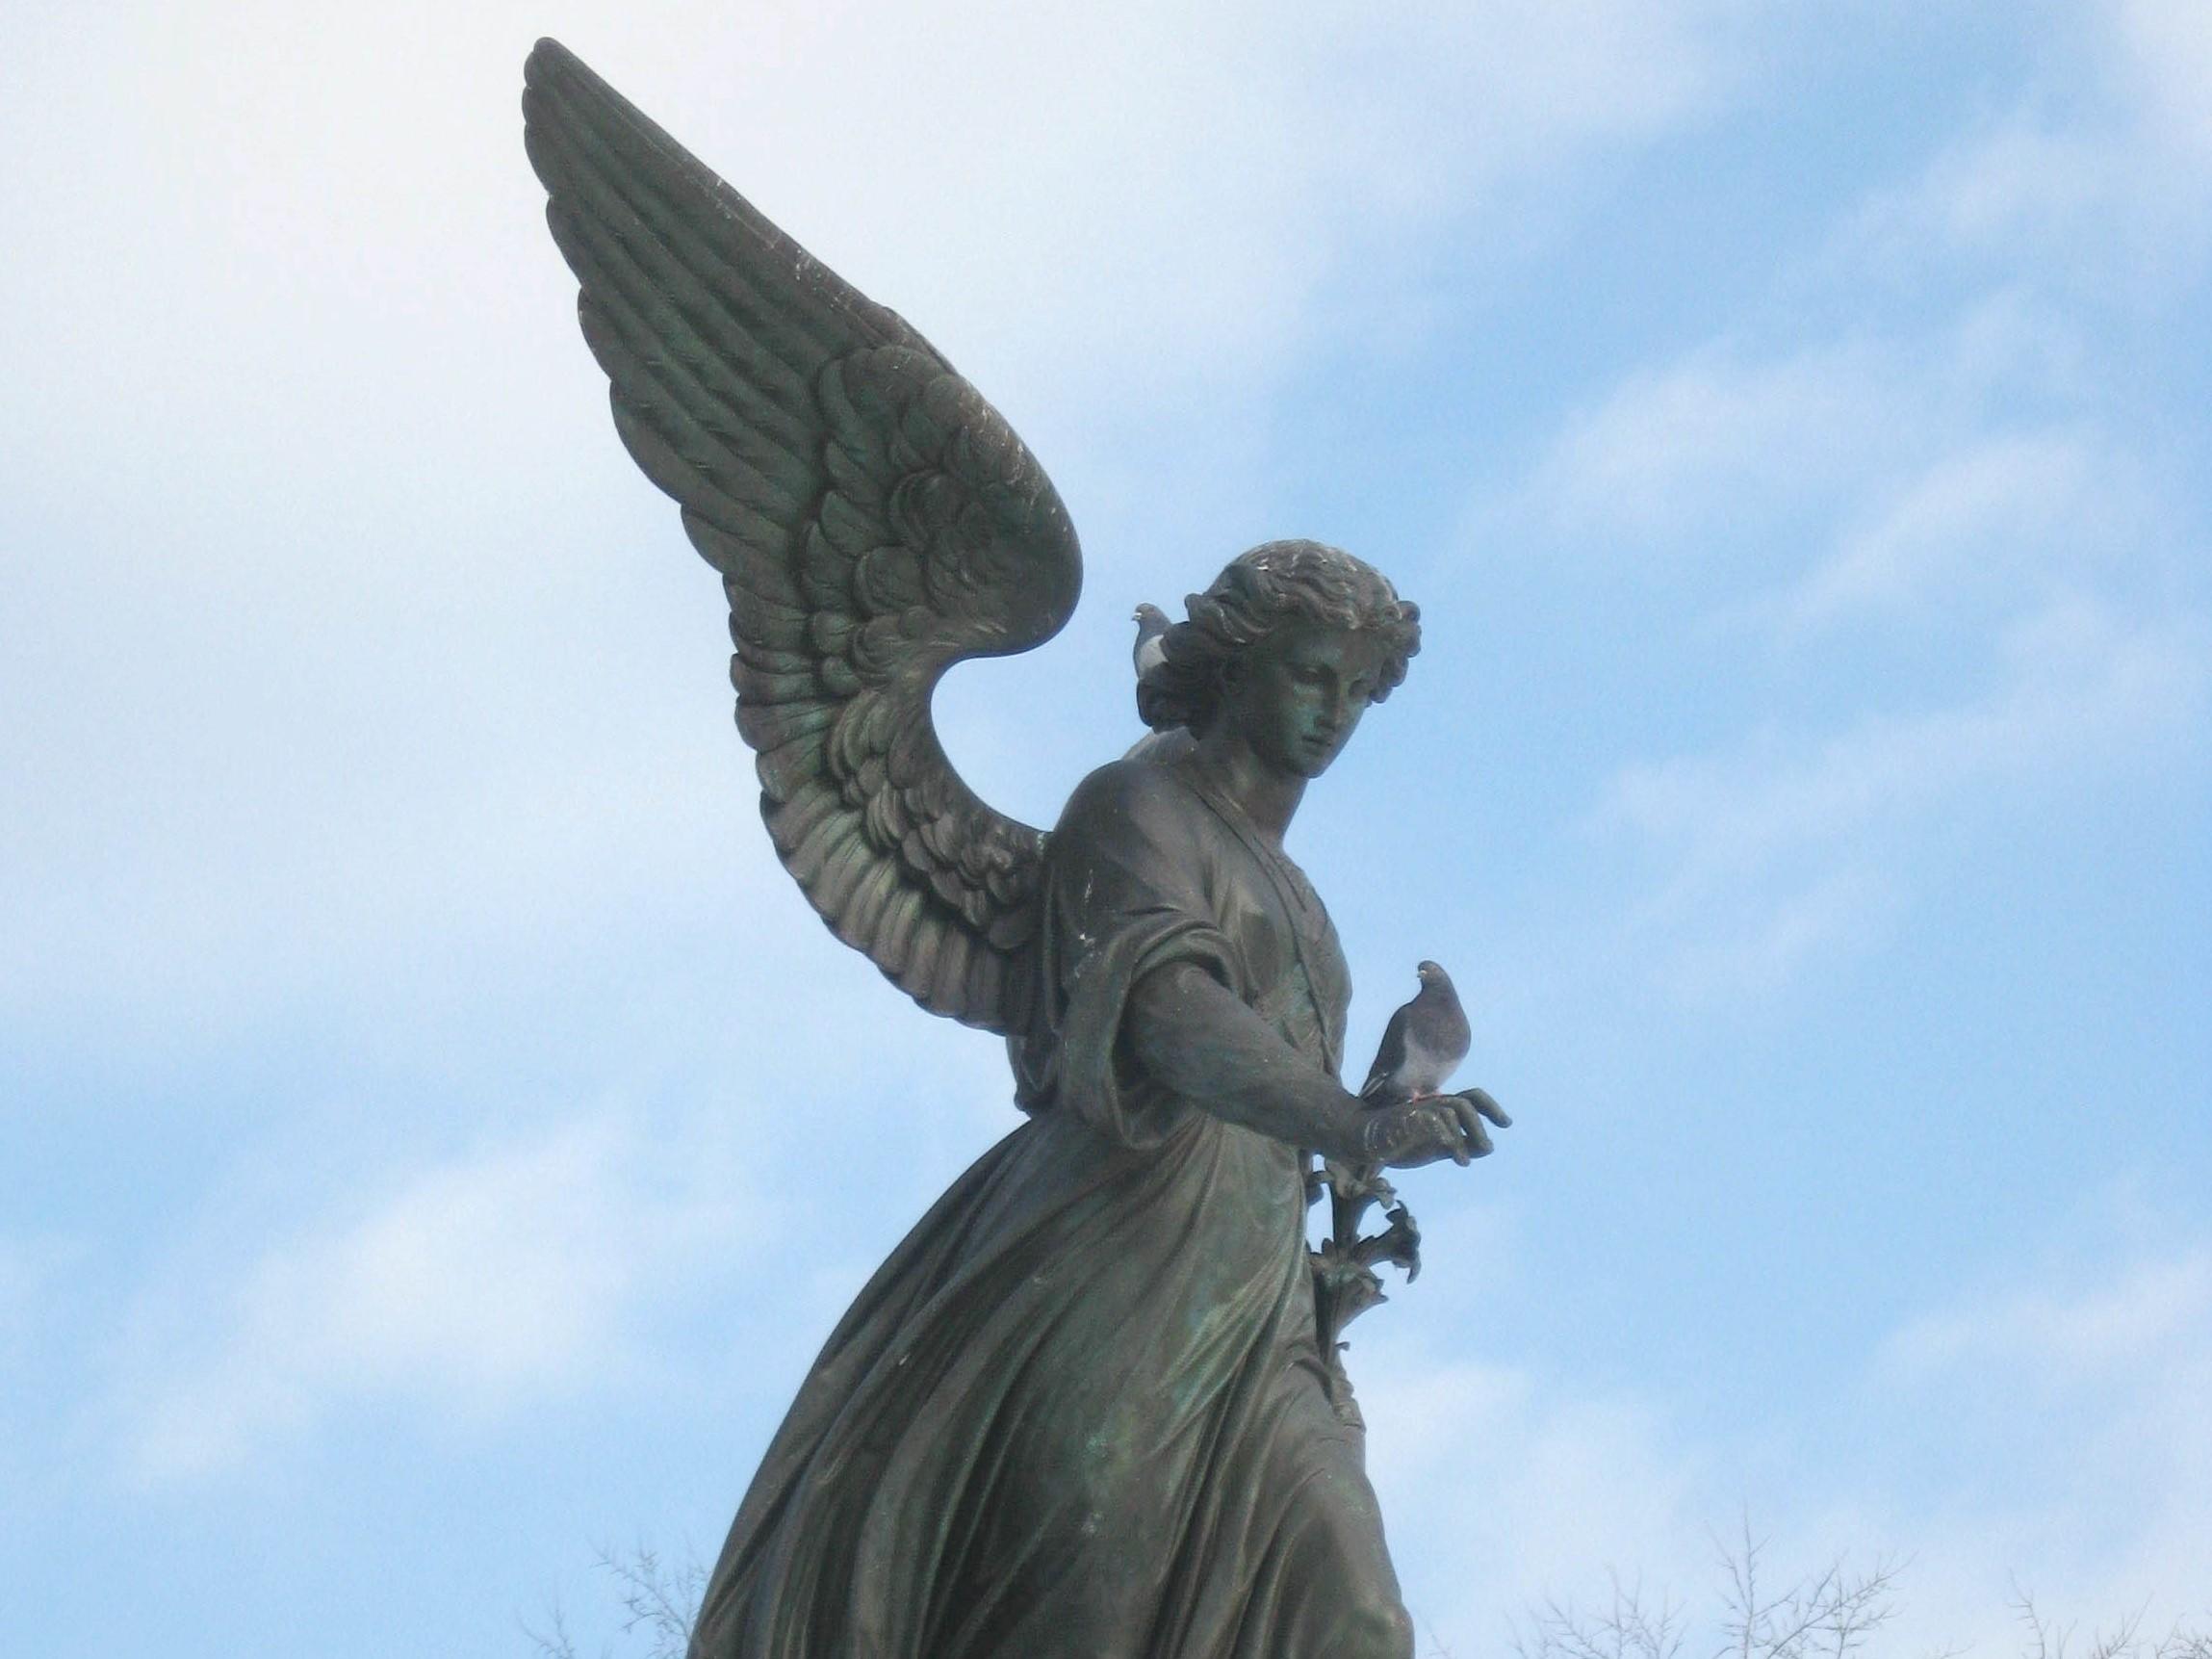 The fallen angel seeking rebellious and unforgivable play 8